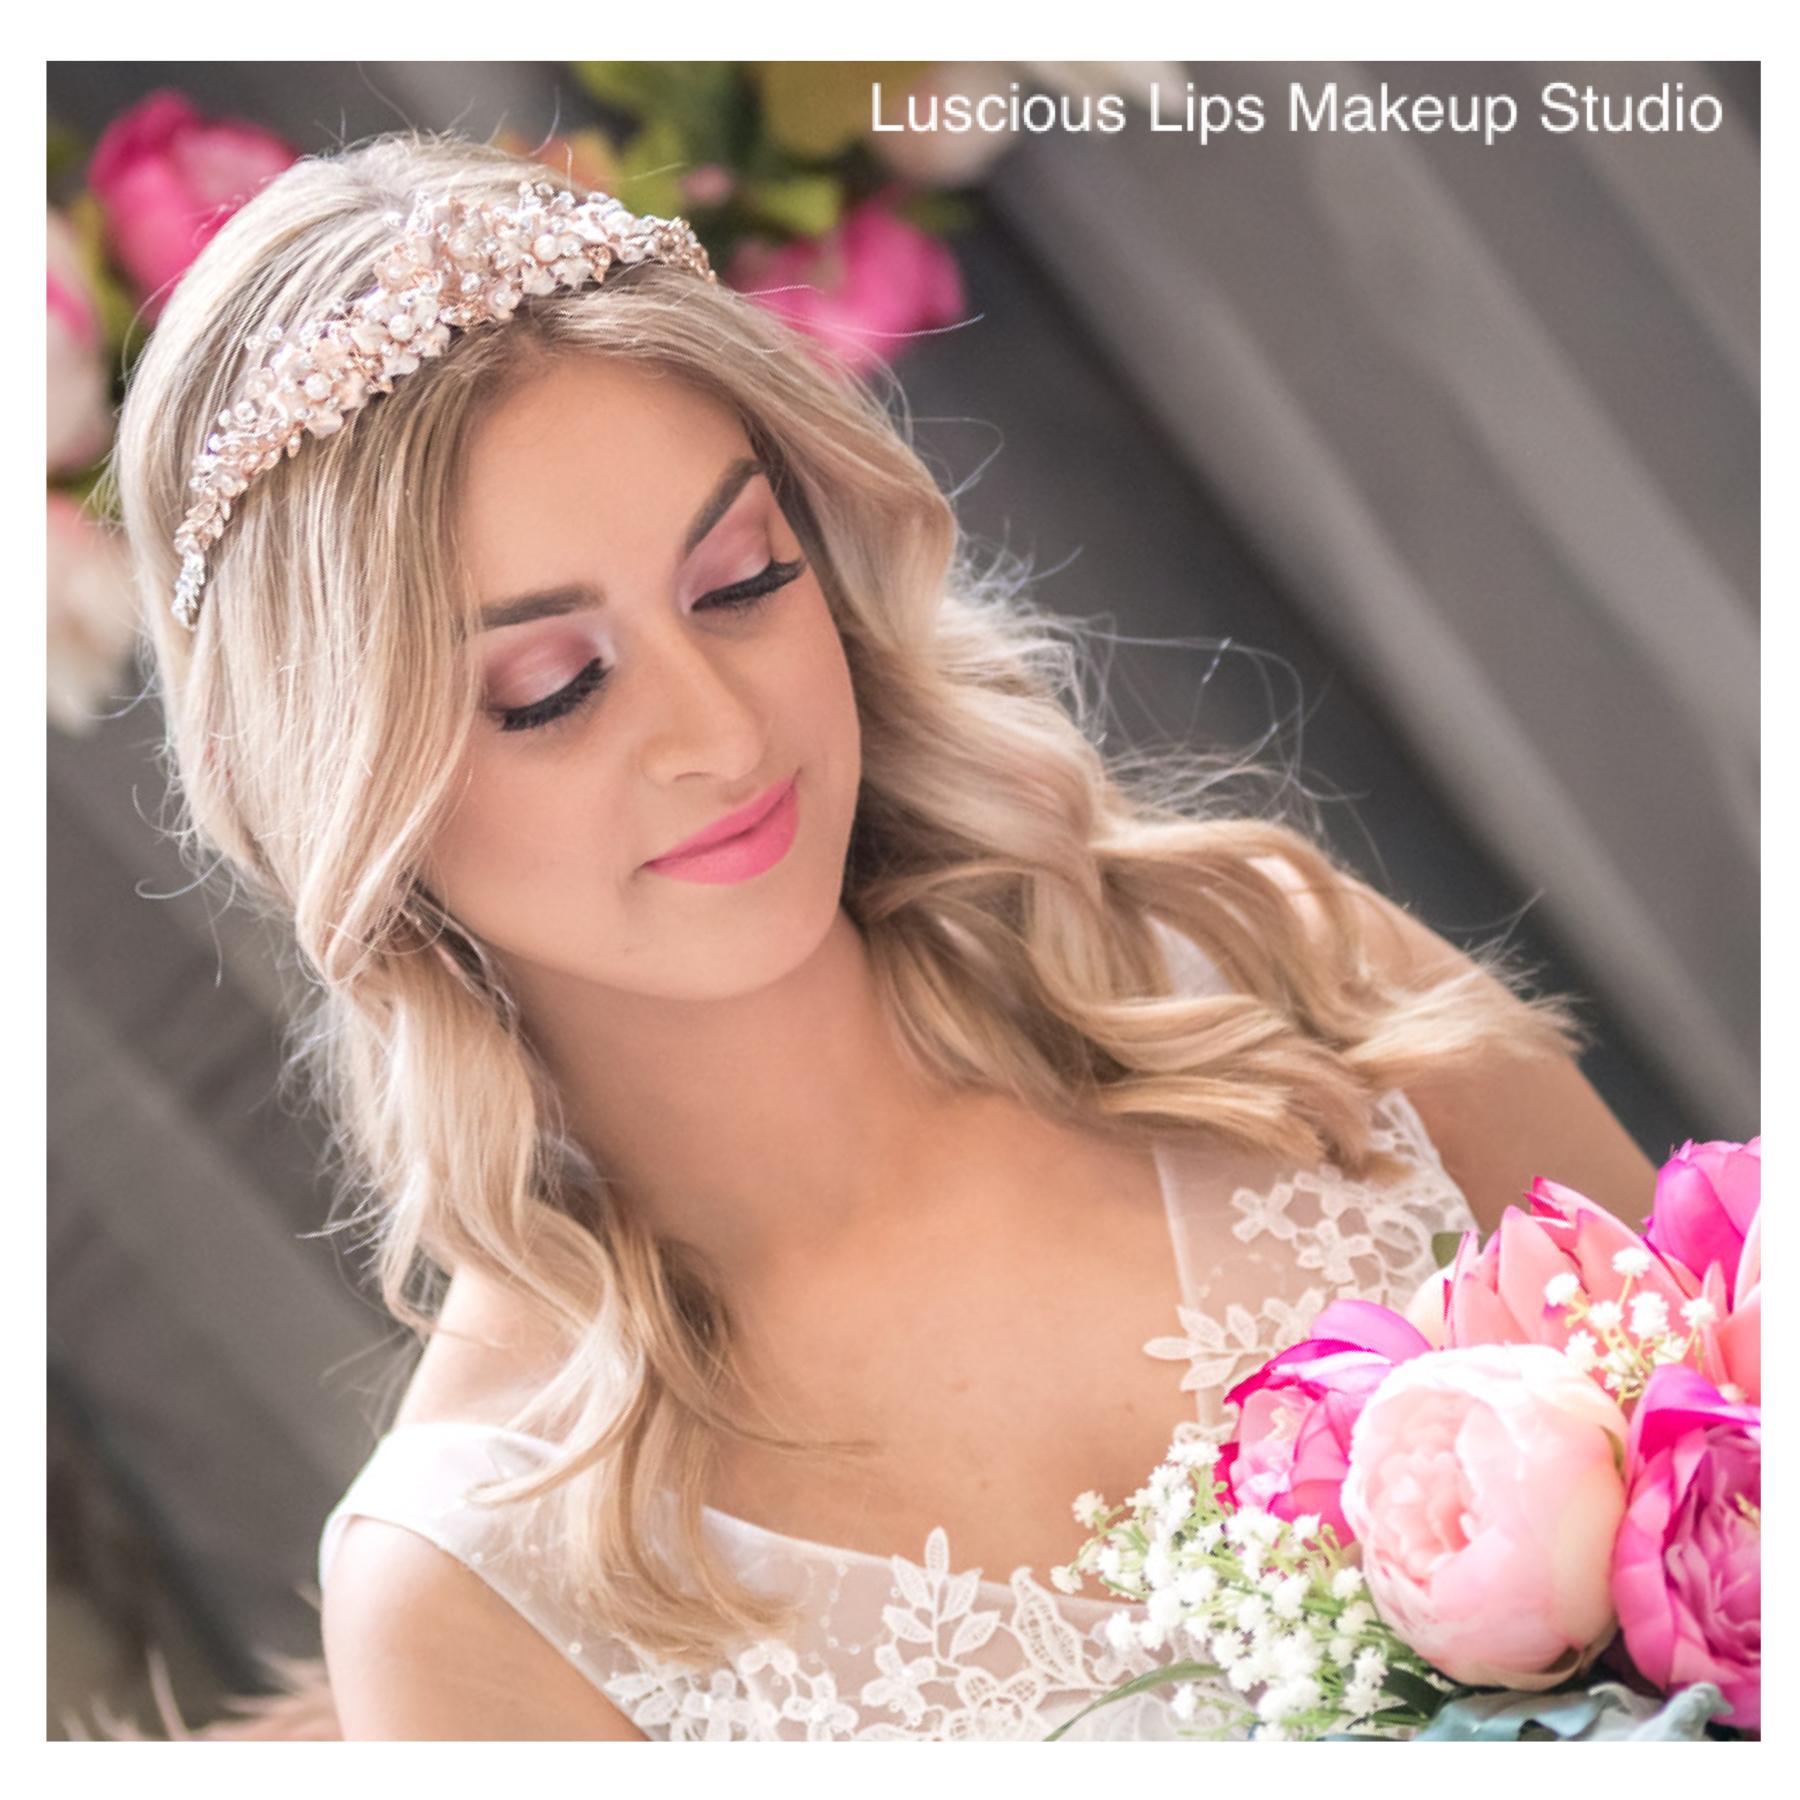 Bridal Makeup (Airbrushed)